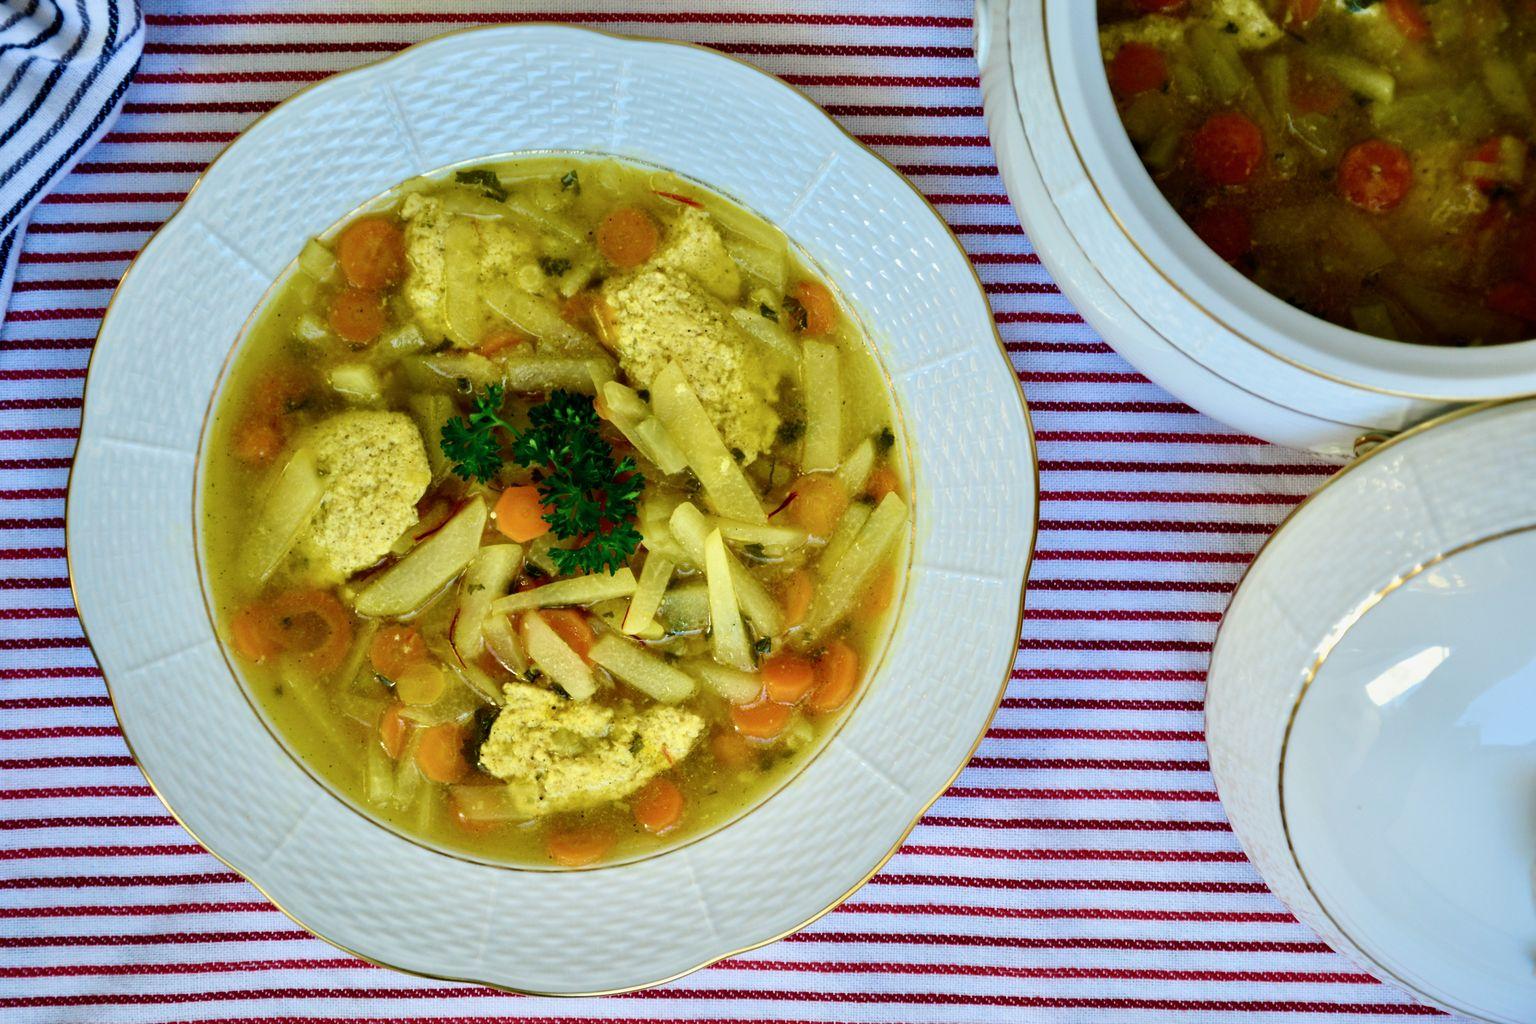 Kohlrabi Soup with Saffron and Almond Dumpling